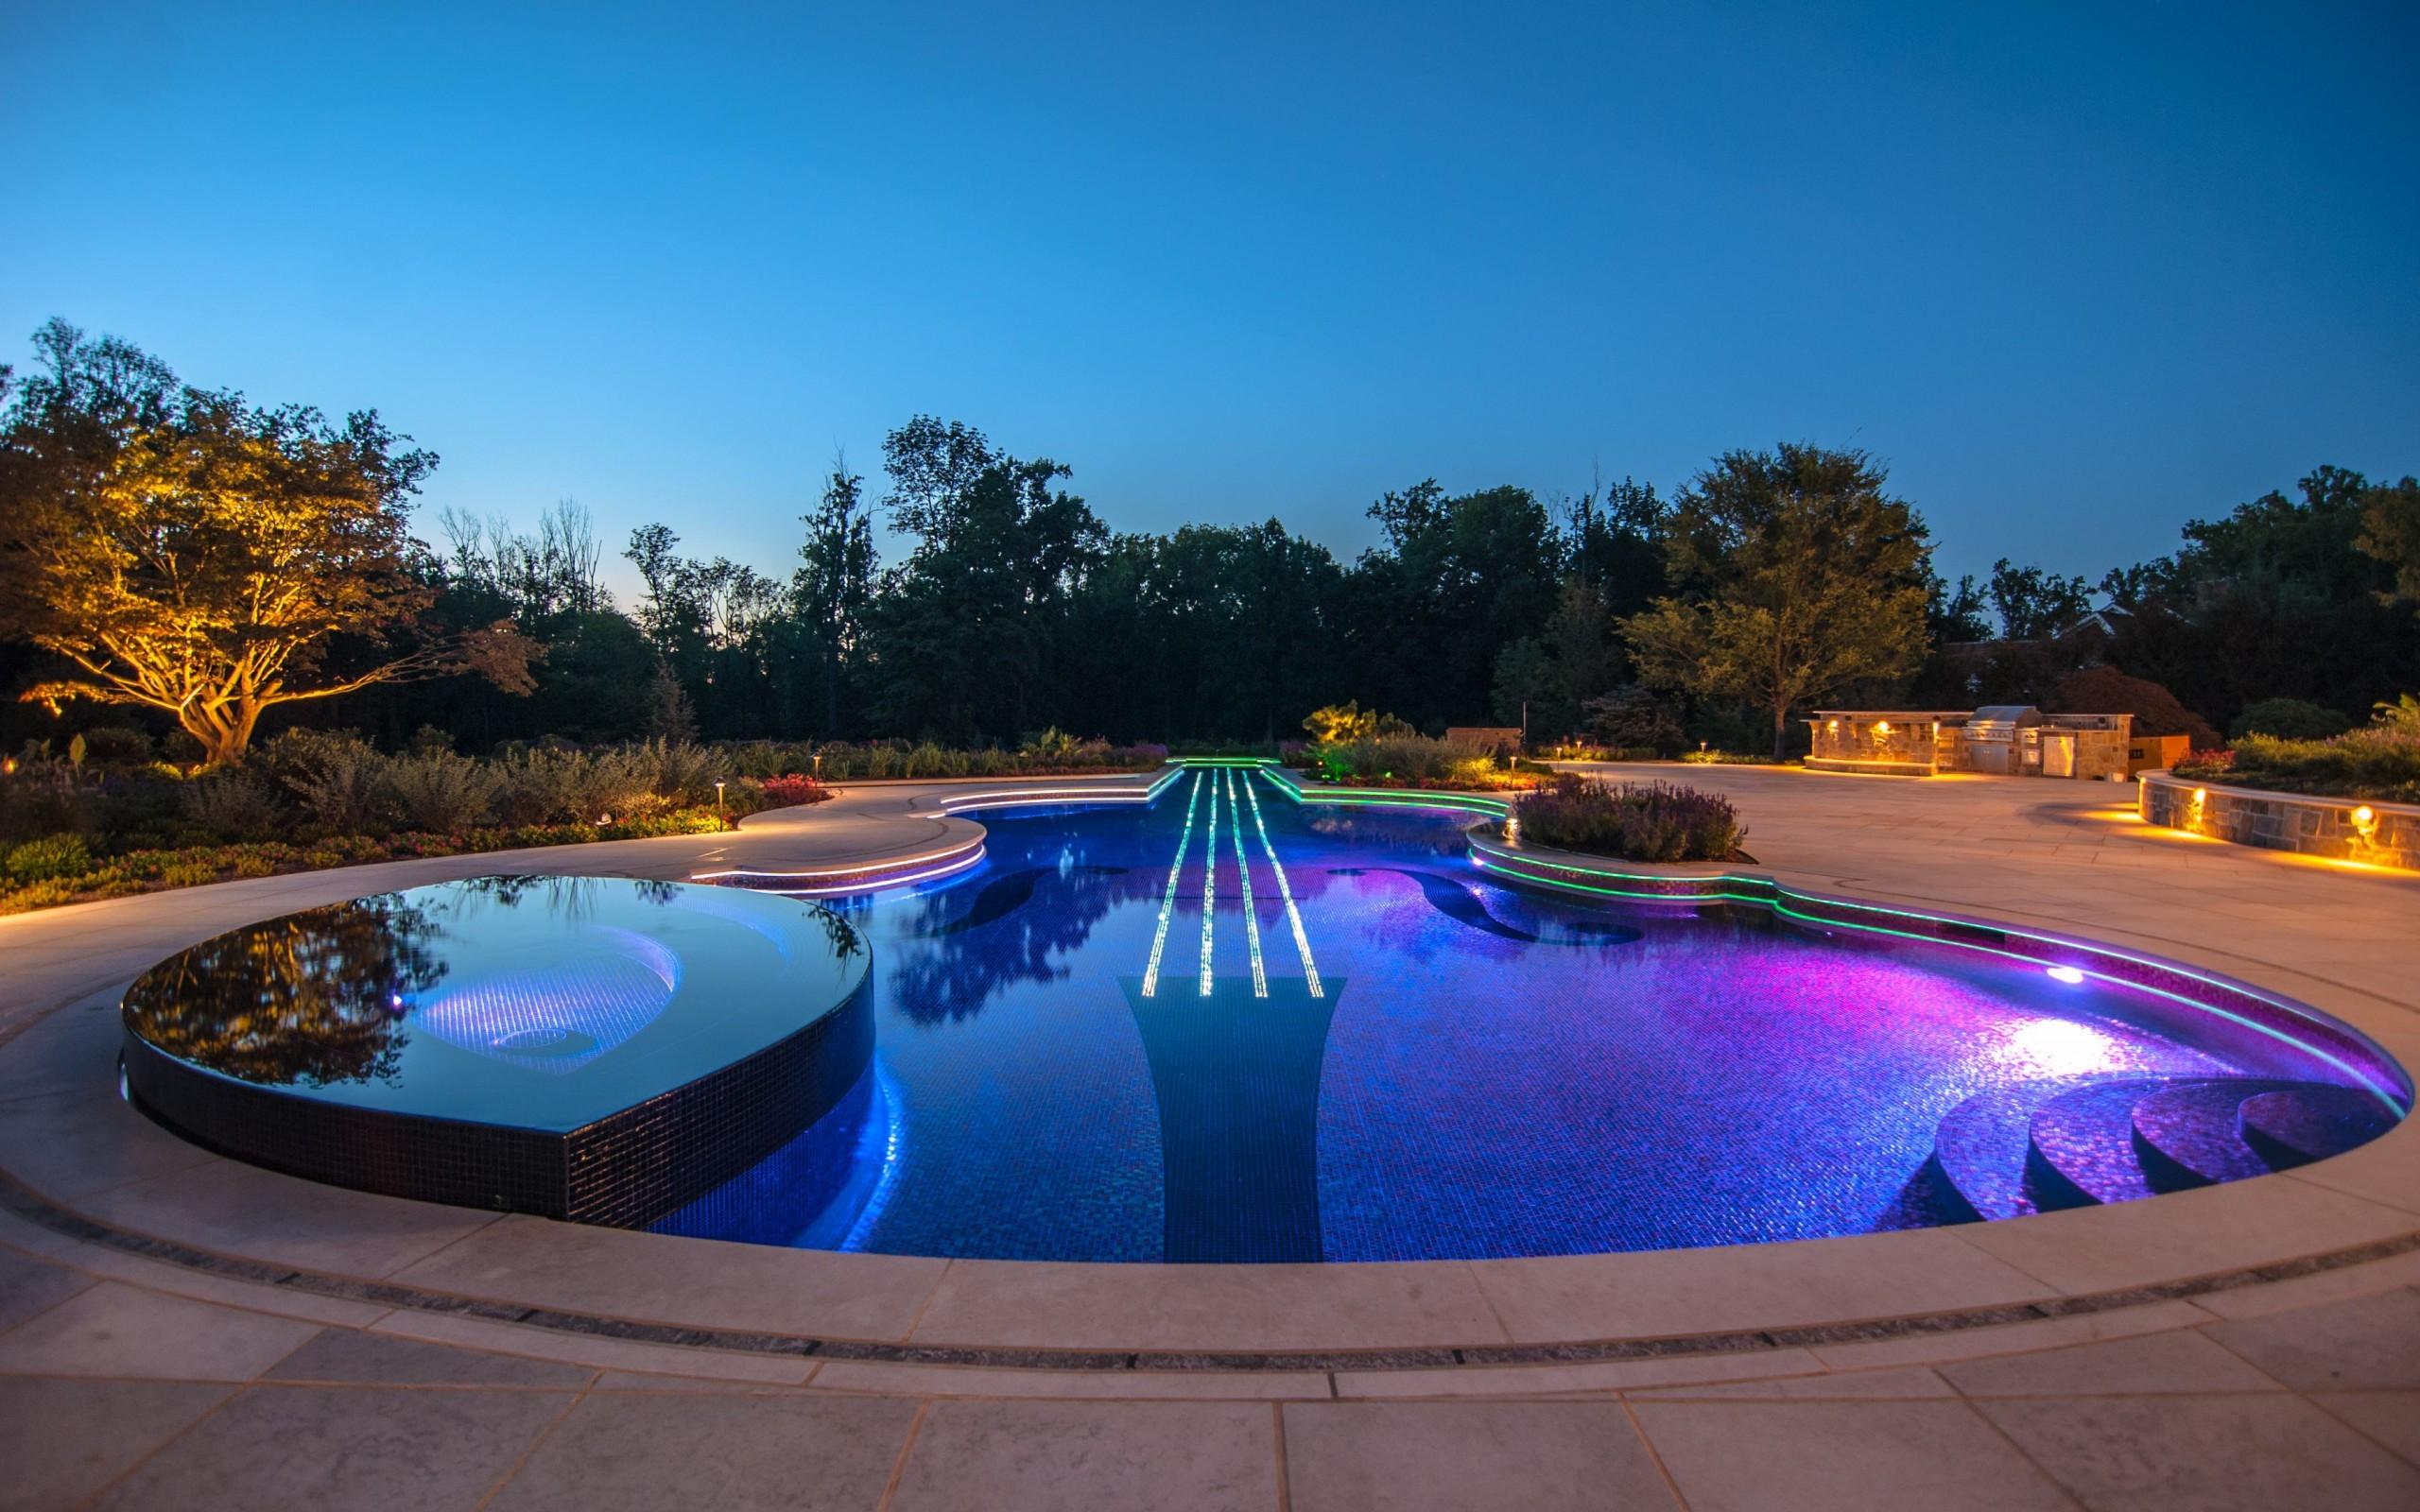 Pool  Wellness City  Größter PoolFachmarkt Europas